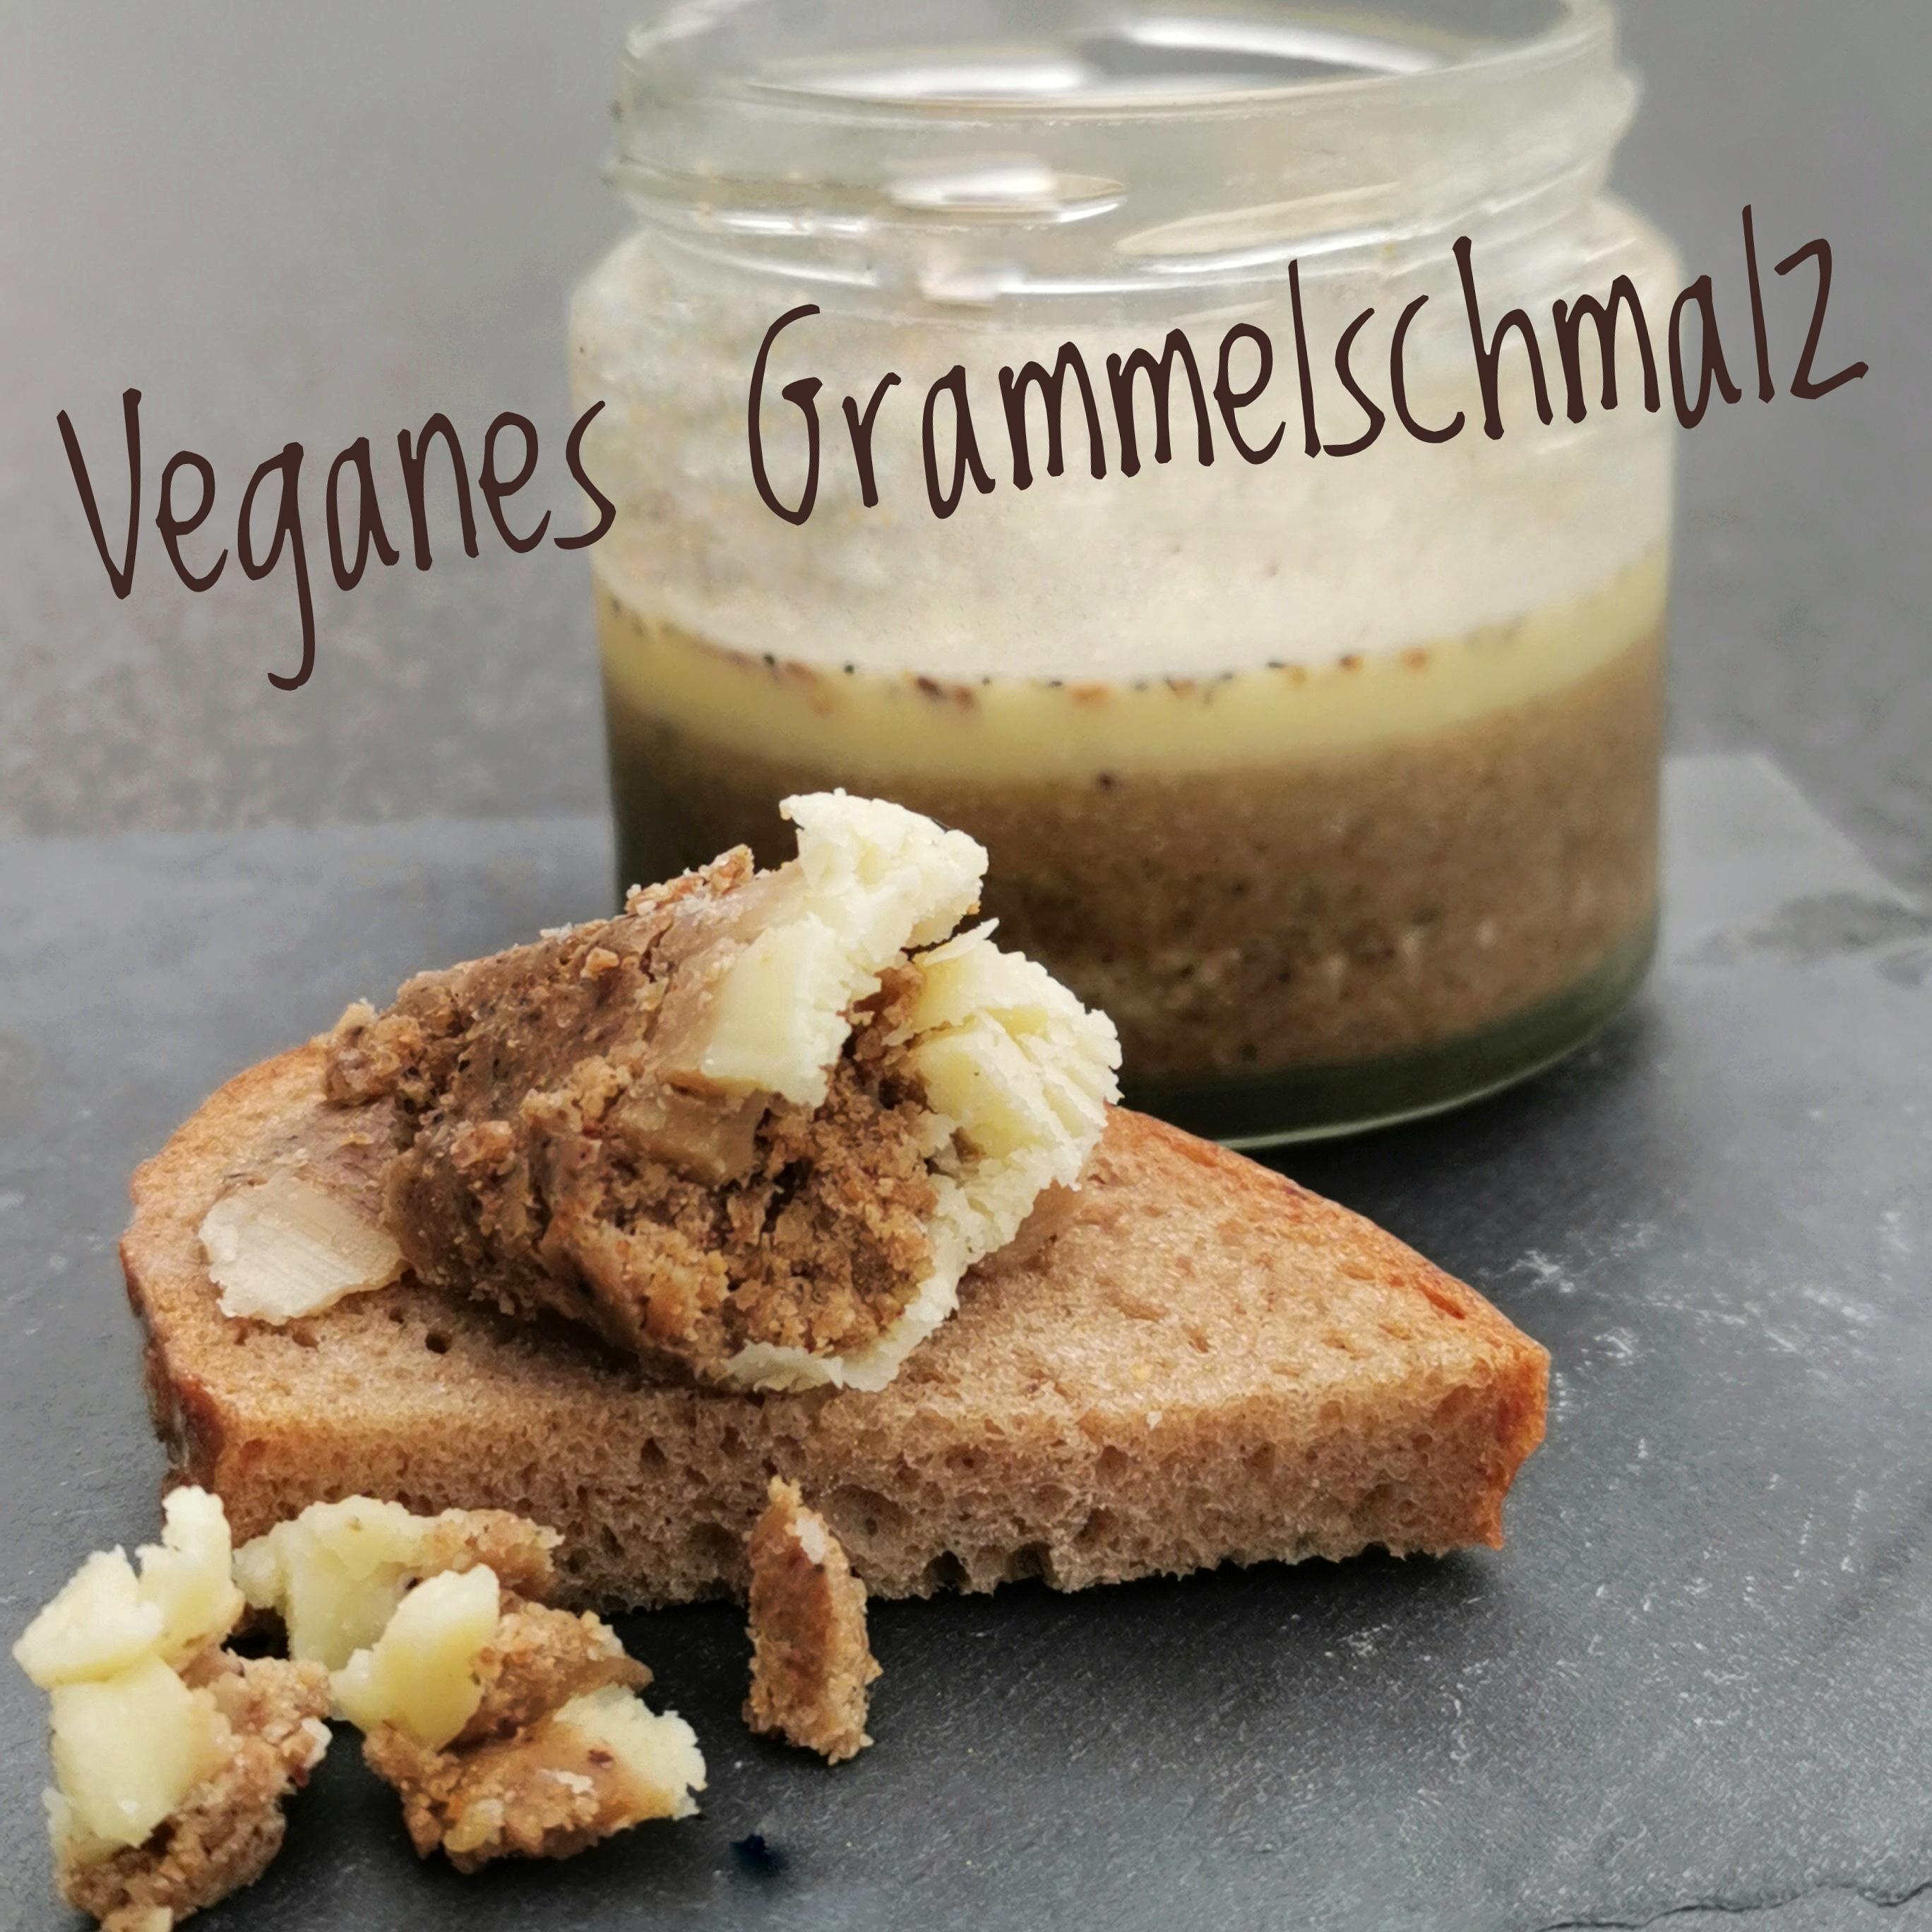 Grammelschmalz vegan